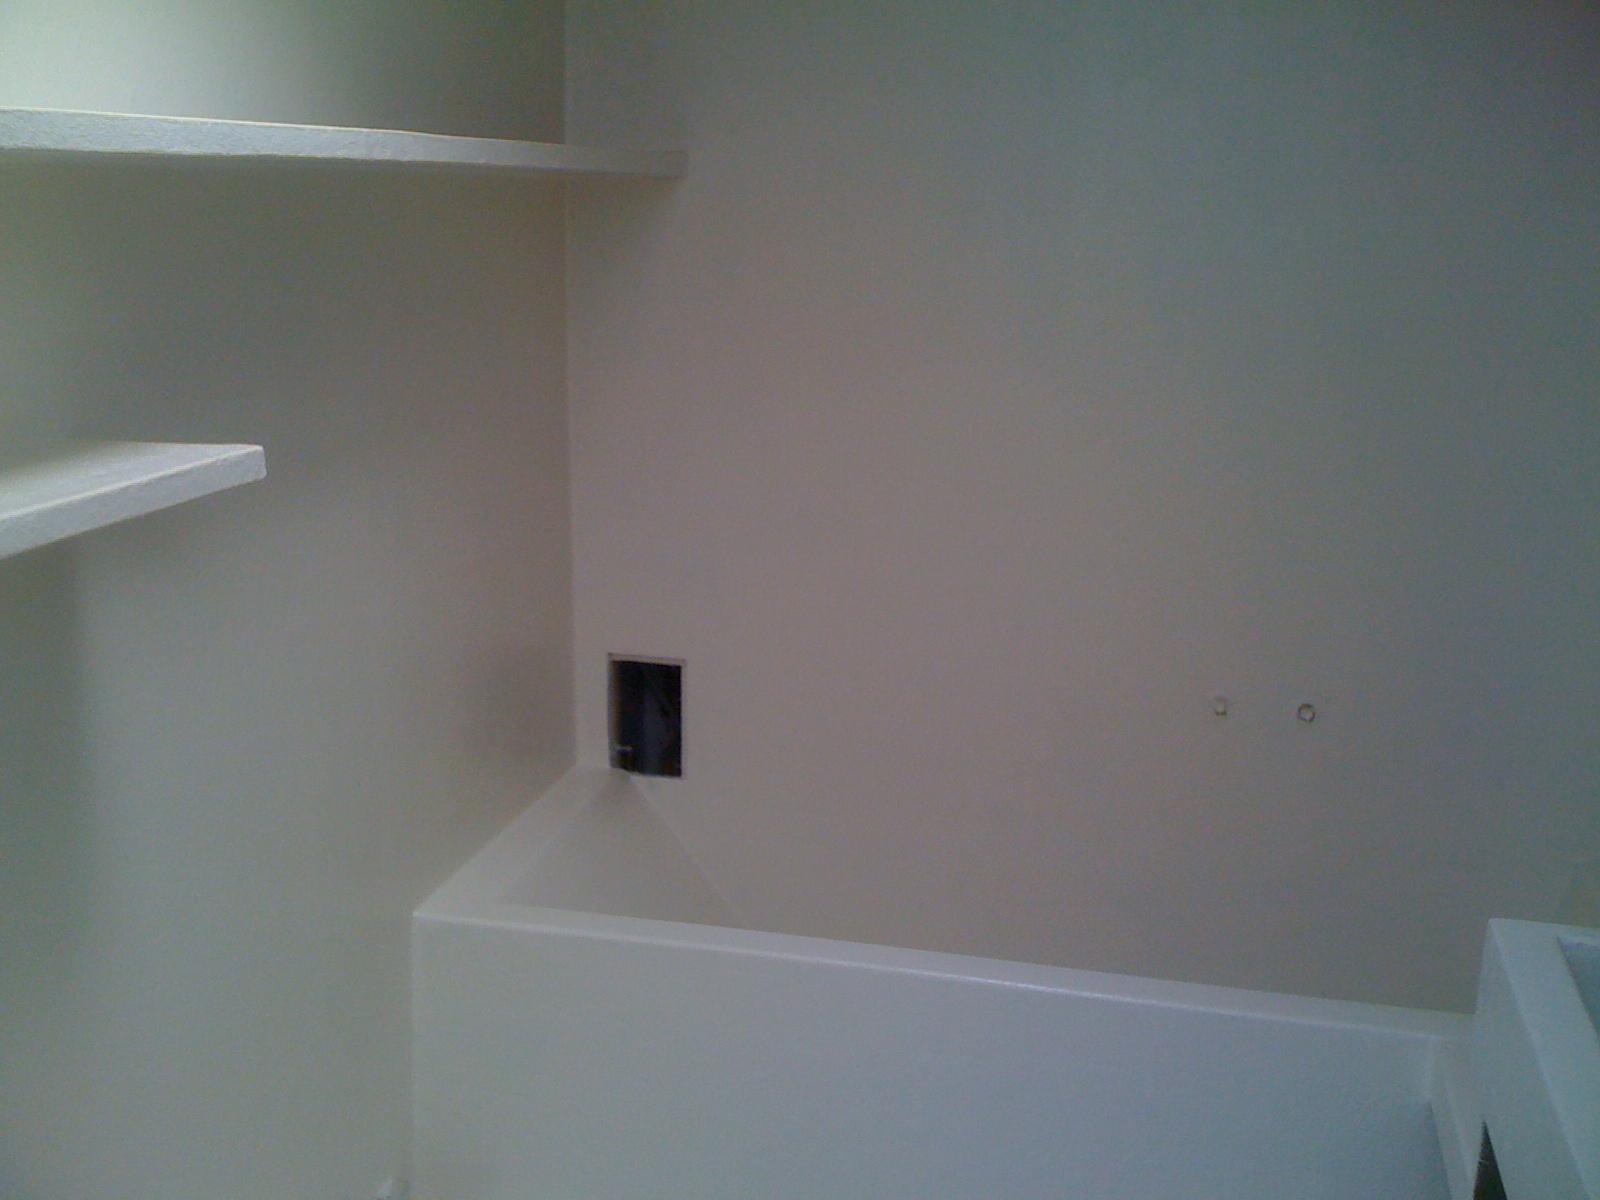 Polyester Badkamer Muur : Ruimtevisser: een badkamer uit polyester